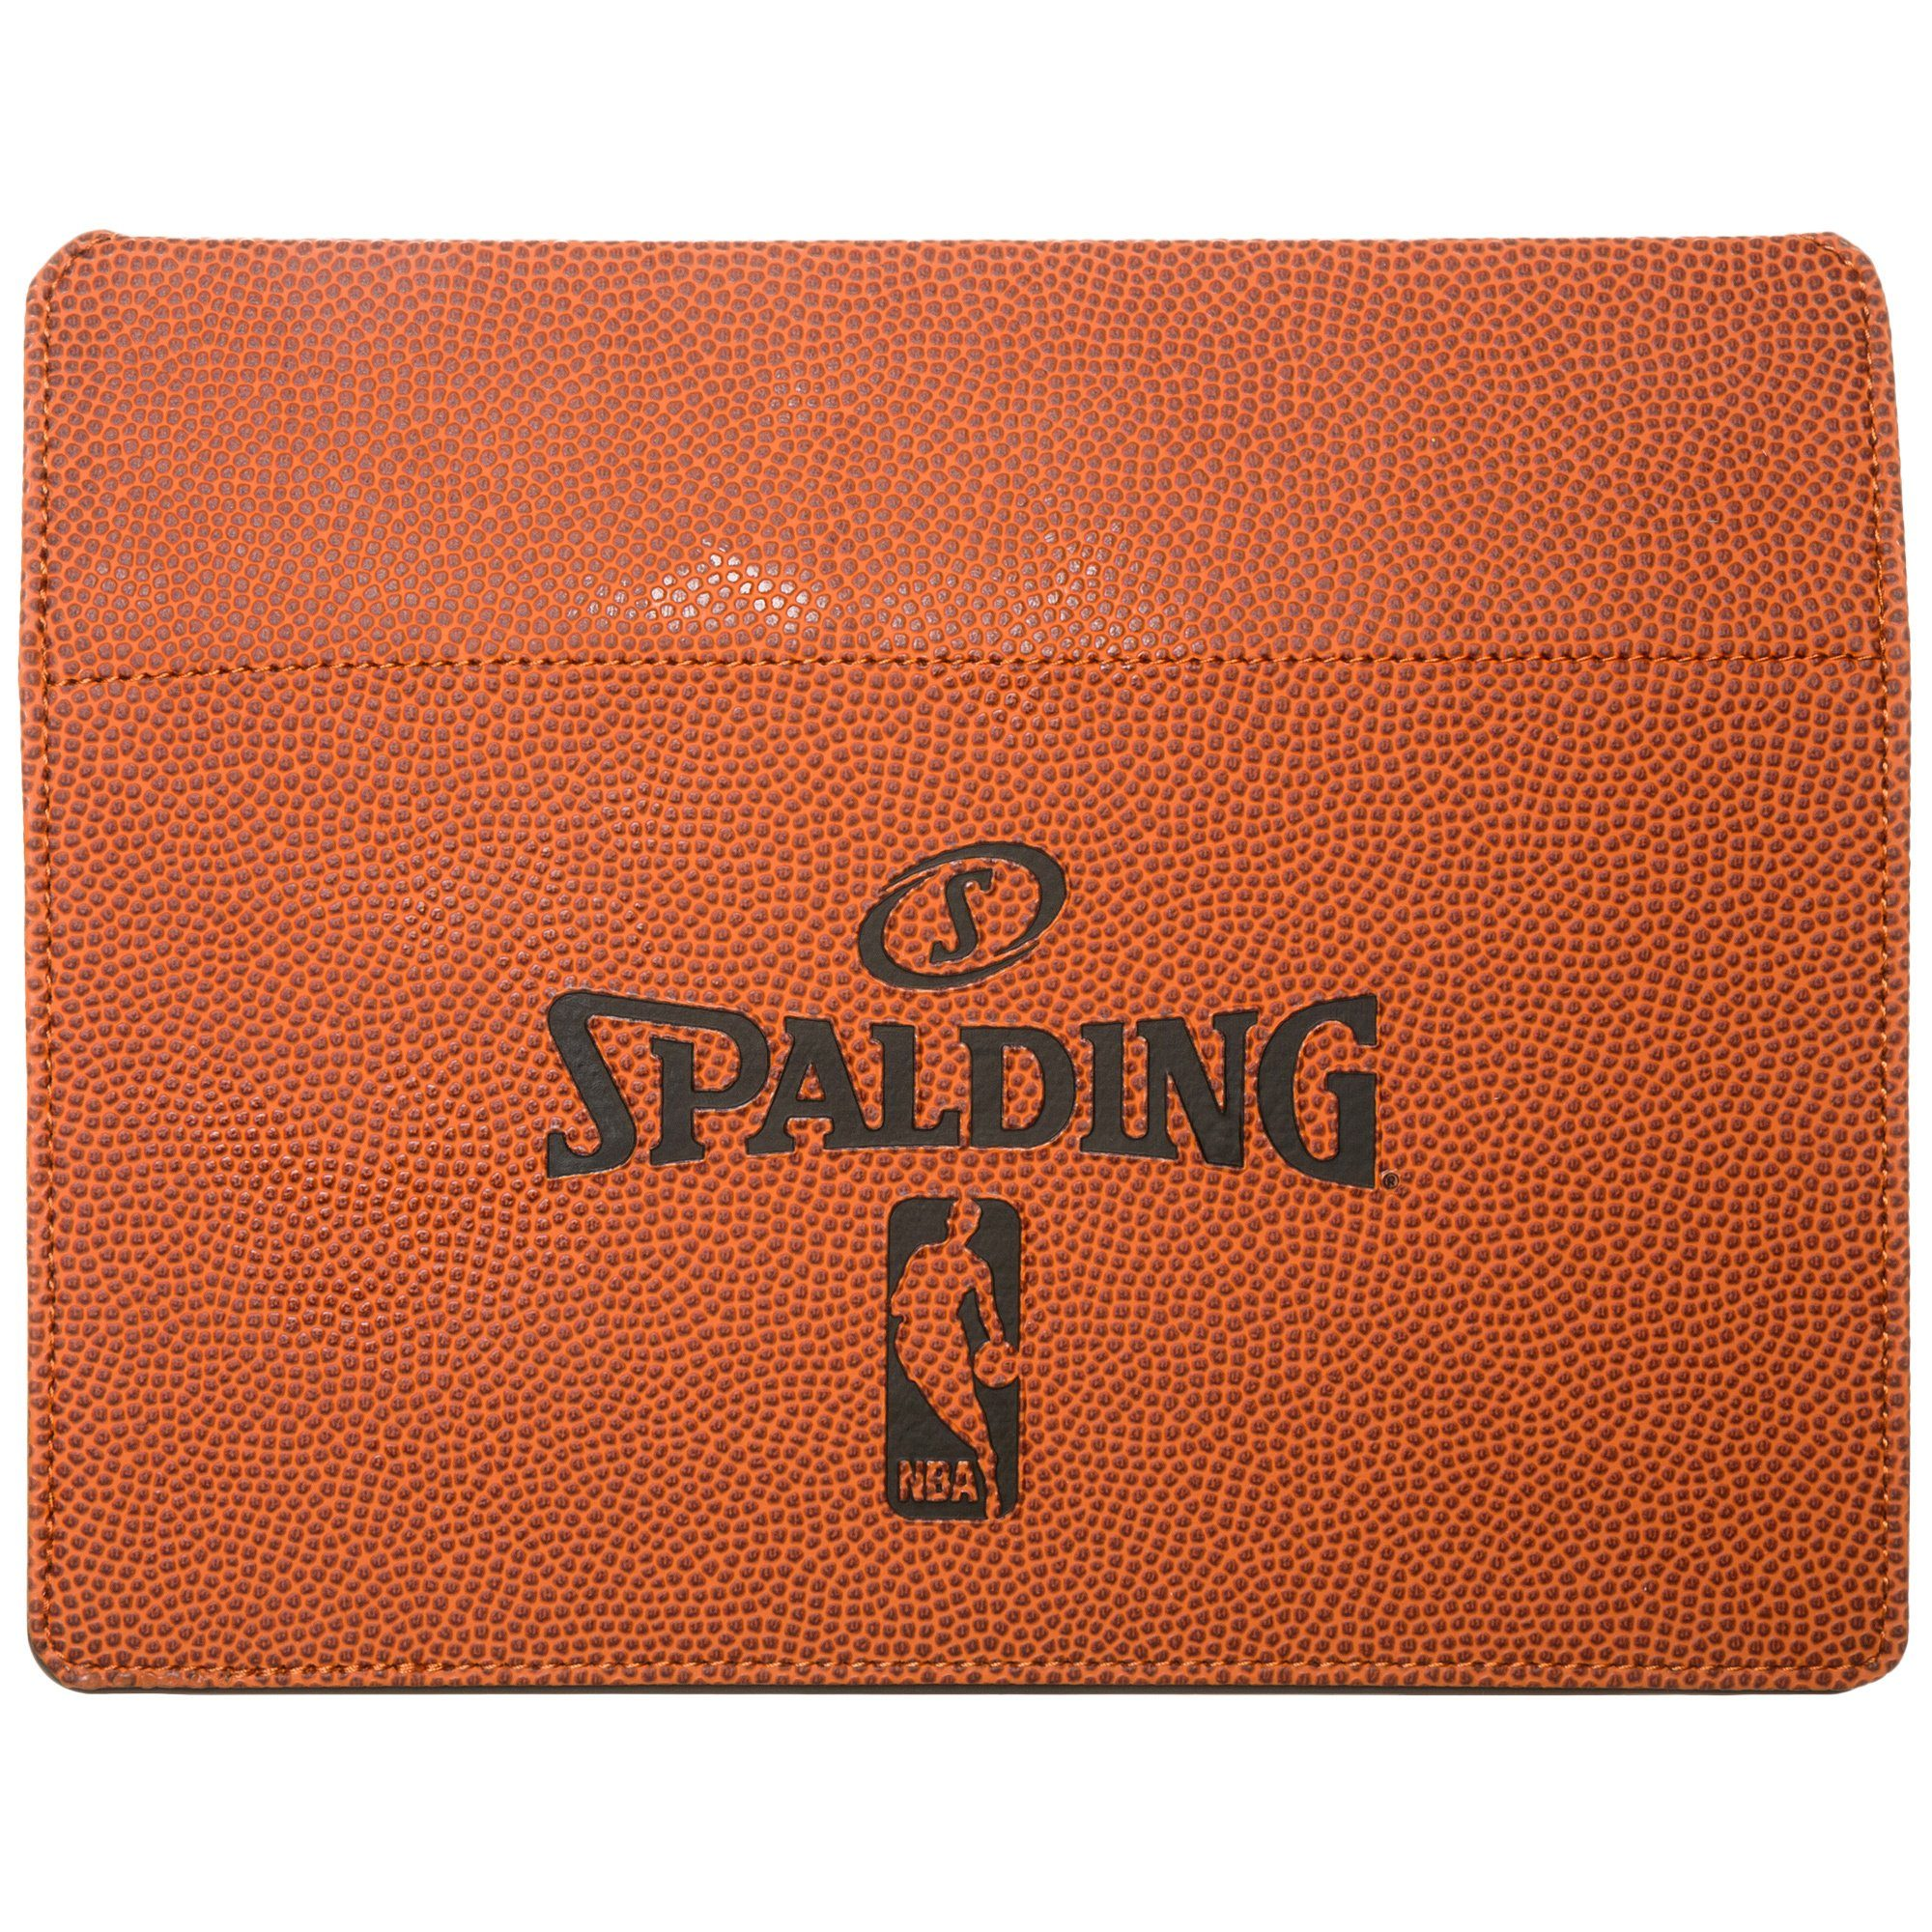 Spalding iPad case